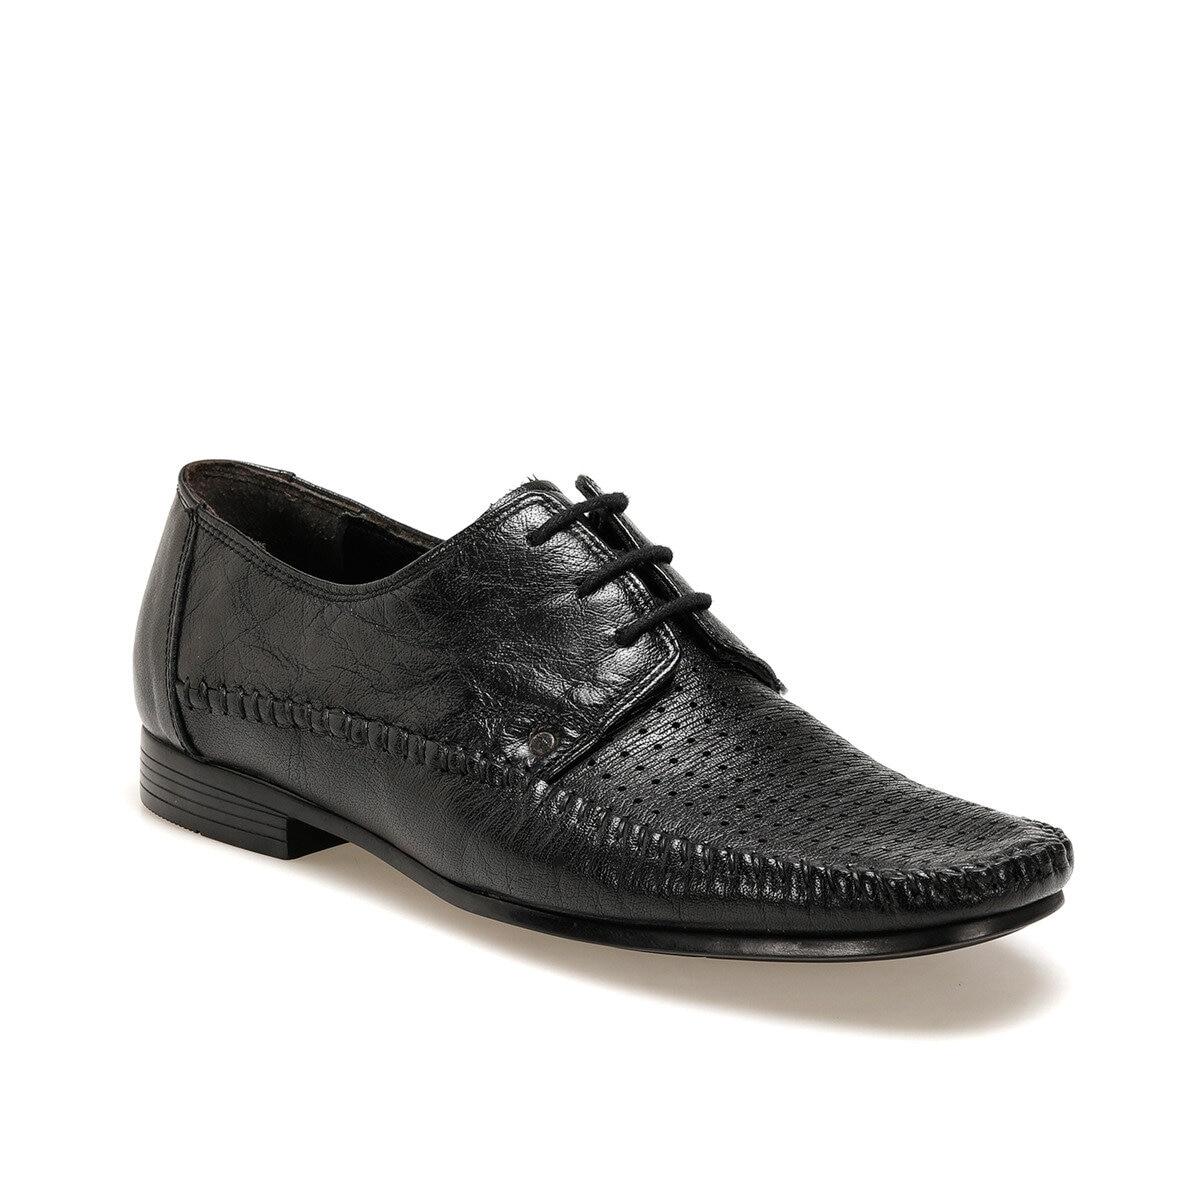 FLO Black Men Casual Shoes Dress Shoes Men's Sneakers Garamond 125